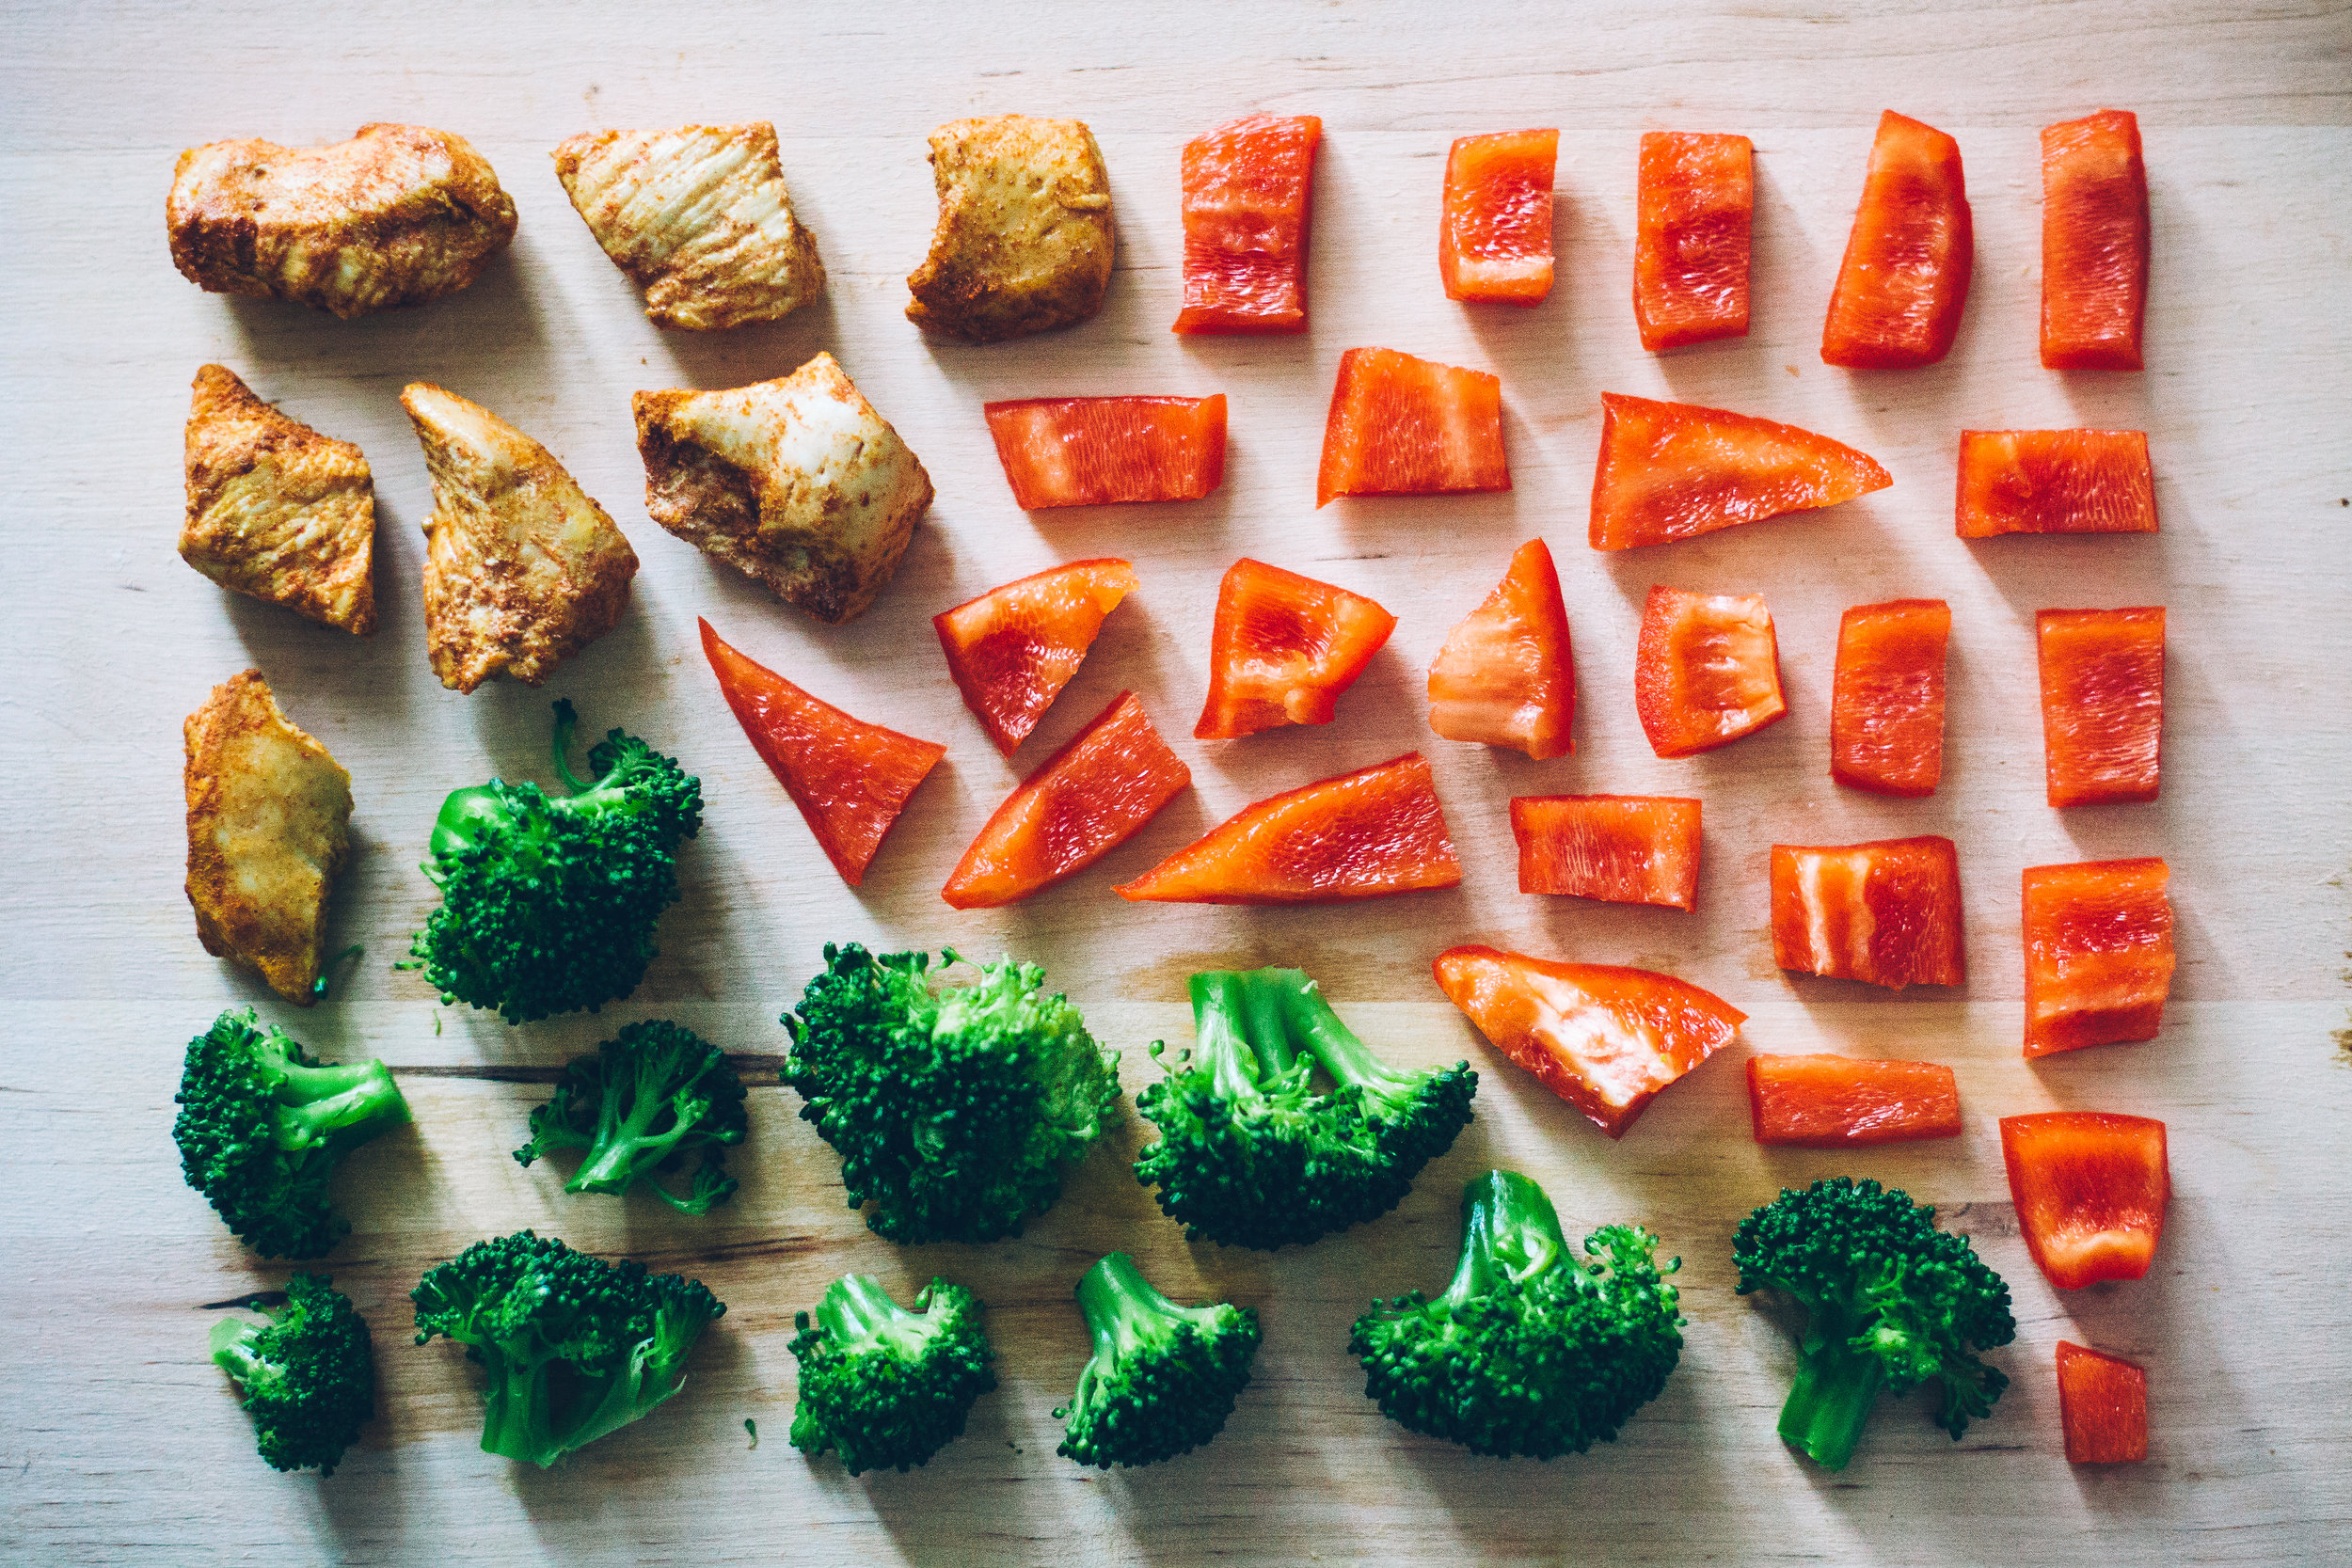 veggies and chicken on a cutting board.jpg